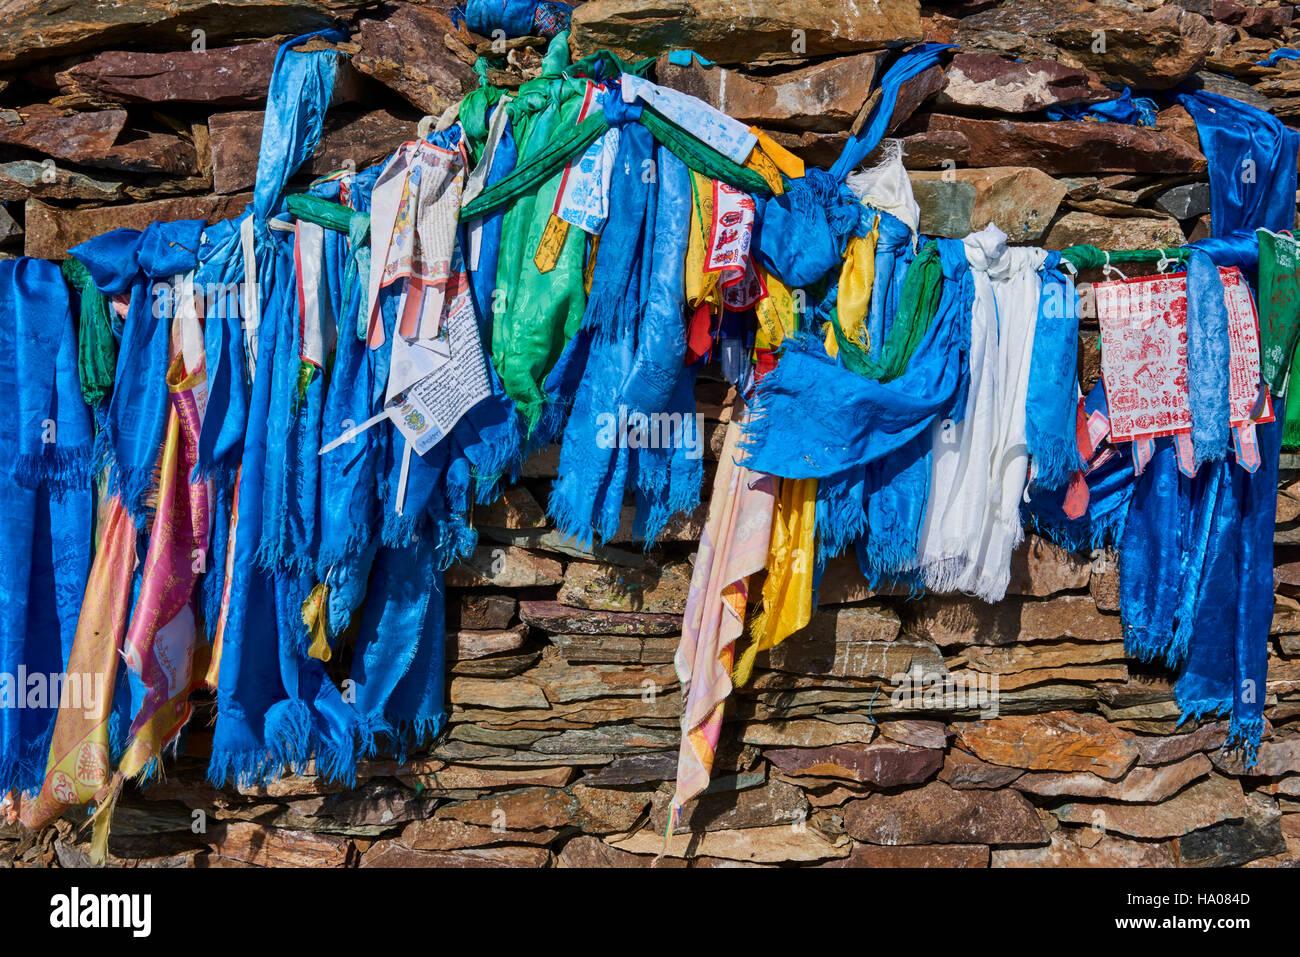 Mongolia, Bayan-Ulgii province, western Mongolia, National parc of Tavan Bogd, the shamanic ovoo near Potanine glacier - Stock Image